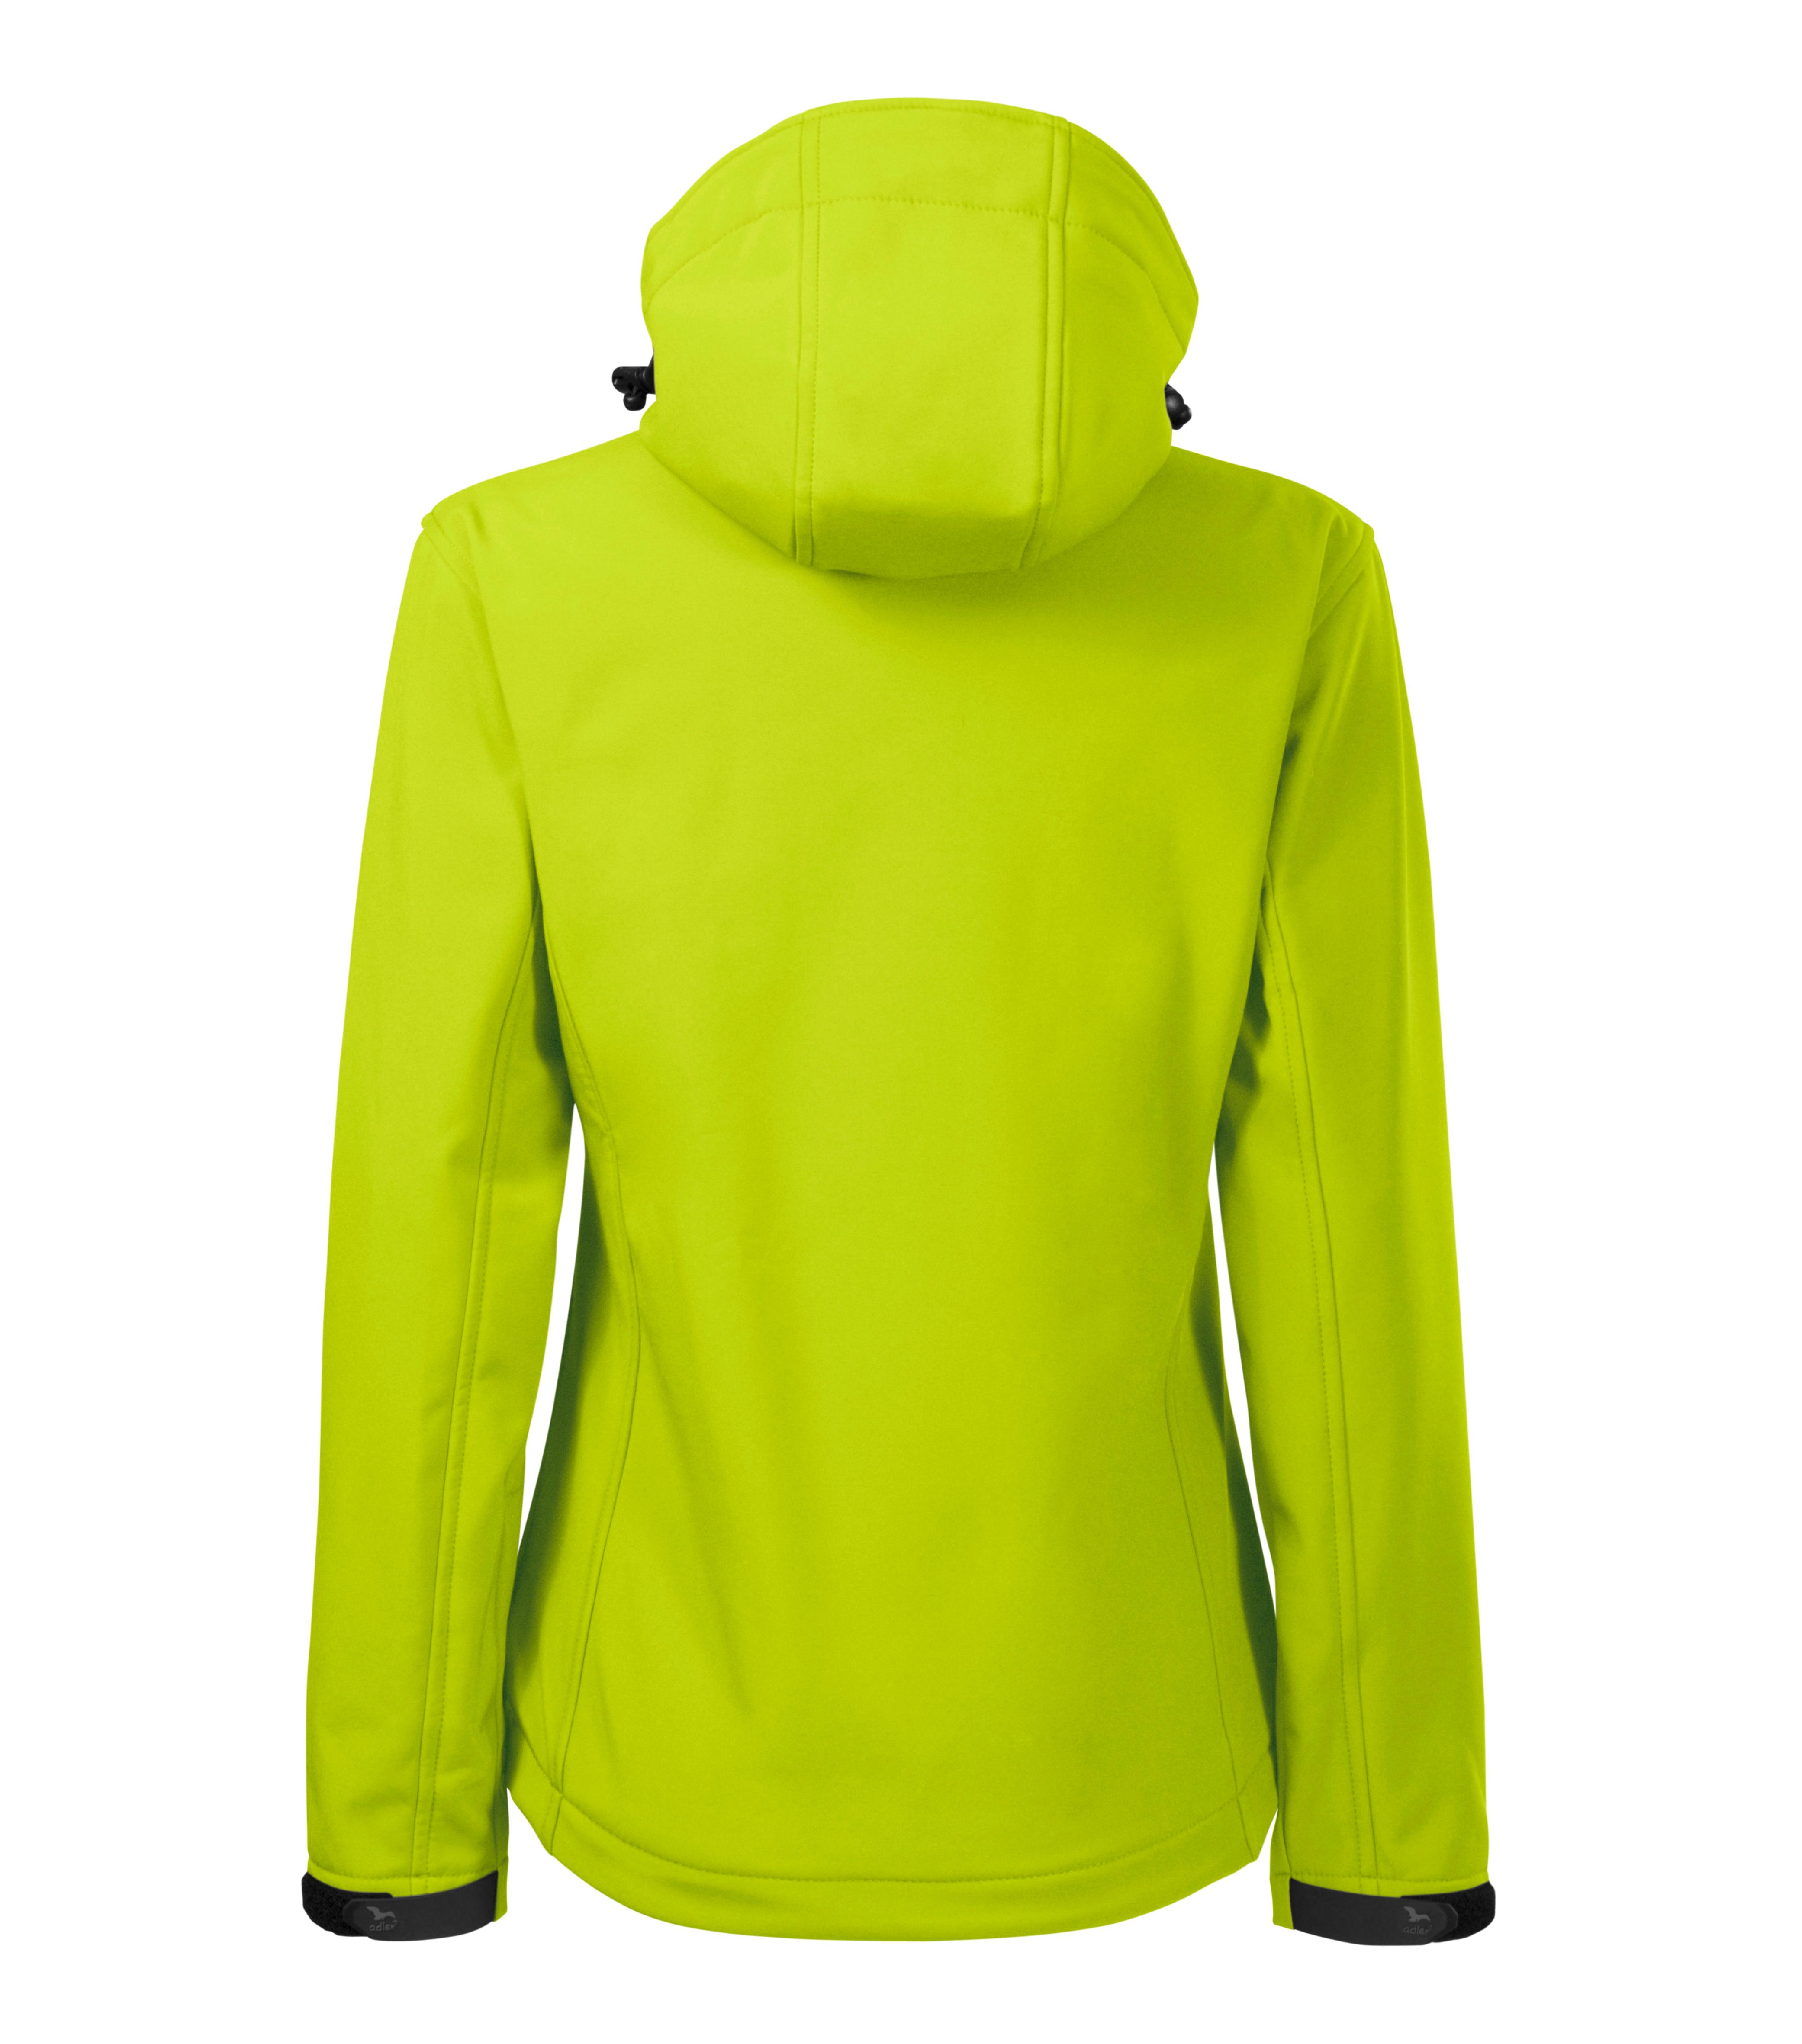 Limonkowa kurtka softshell Performance damska - tył